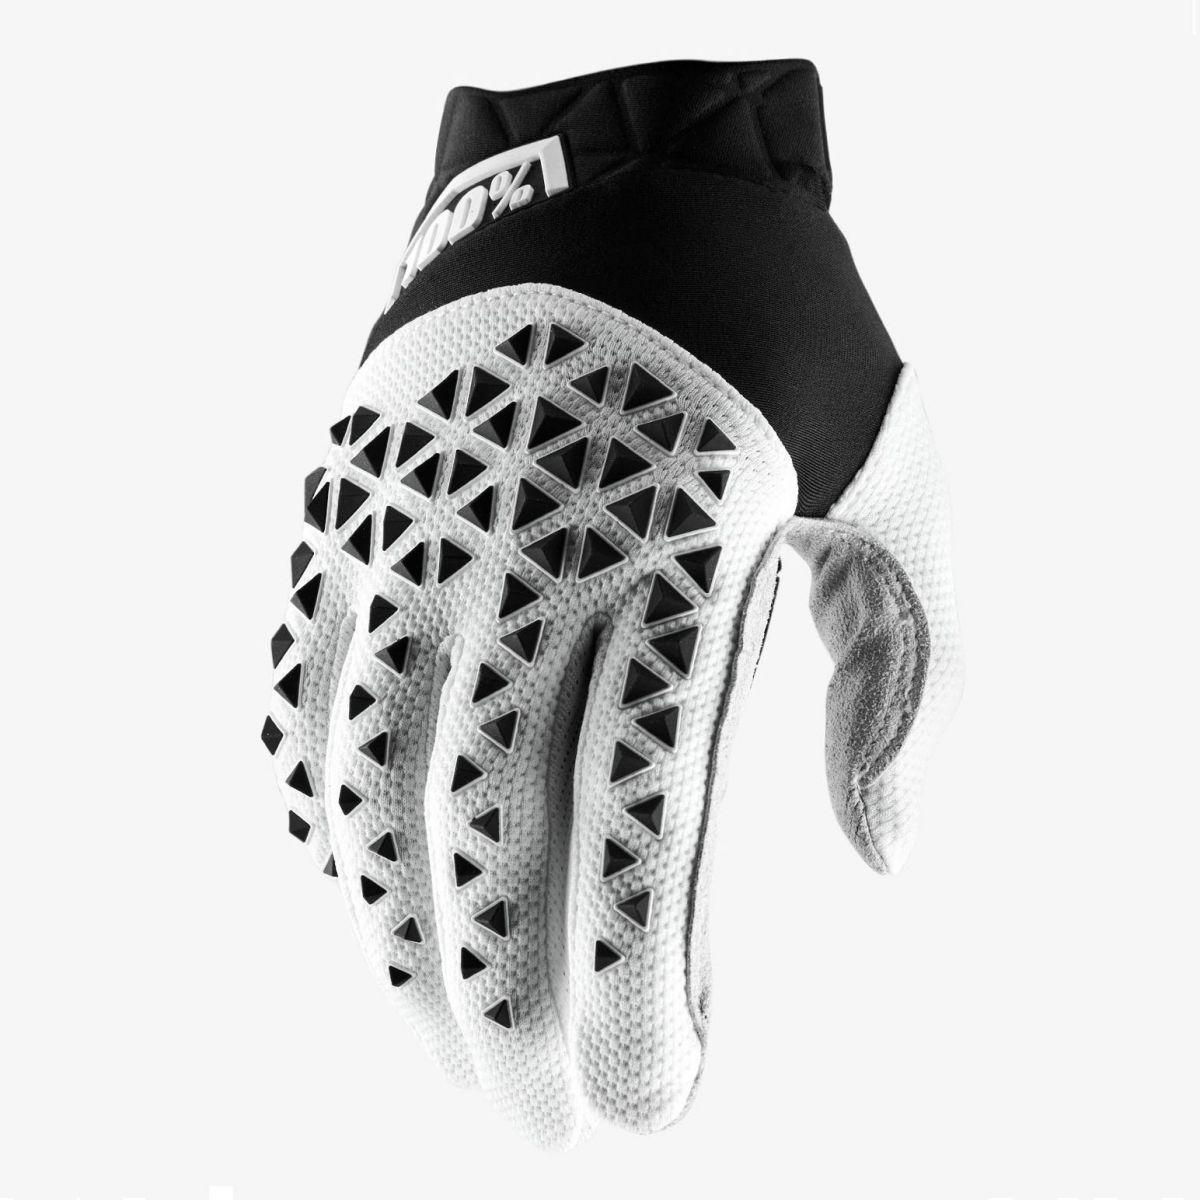 100% - 2019 Airmatic Black/White/Silver перчатки, черно-бело-серые